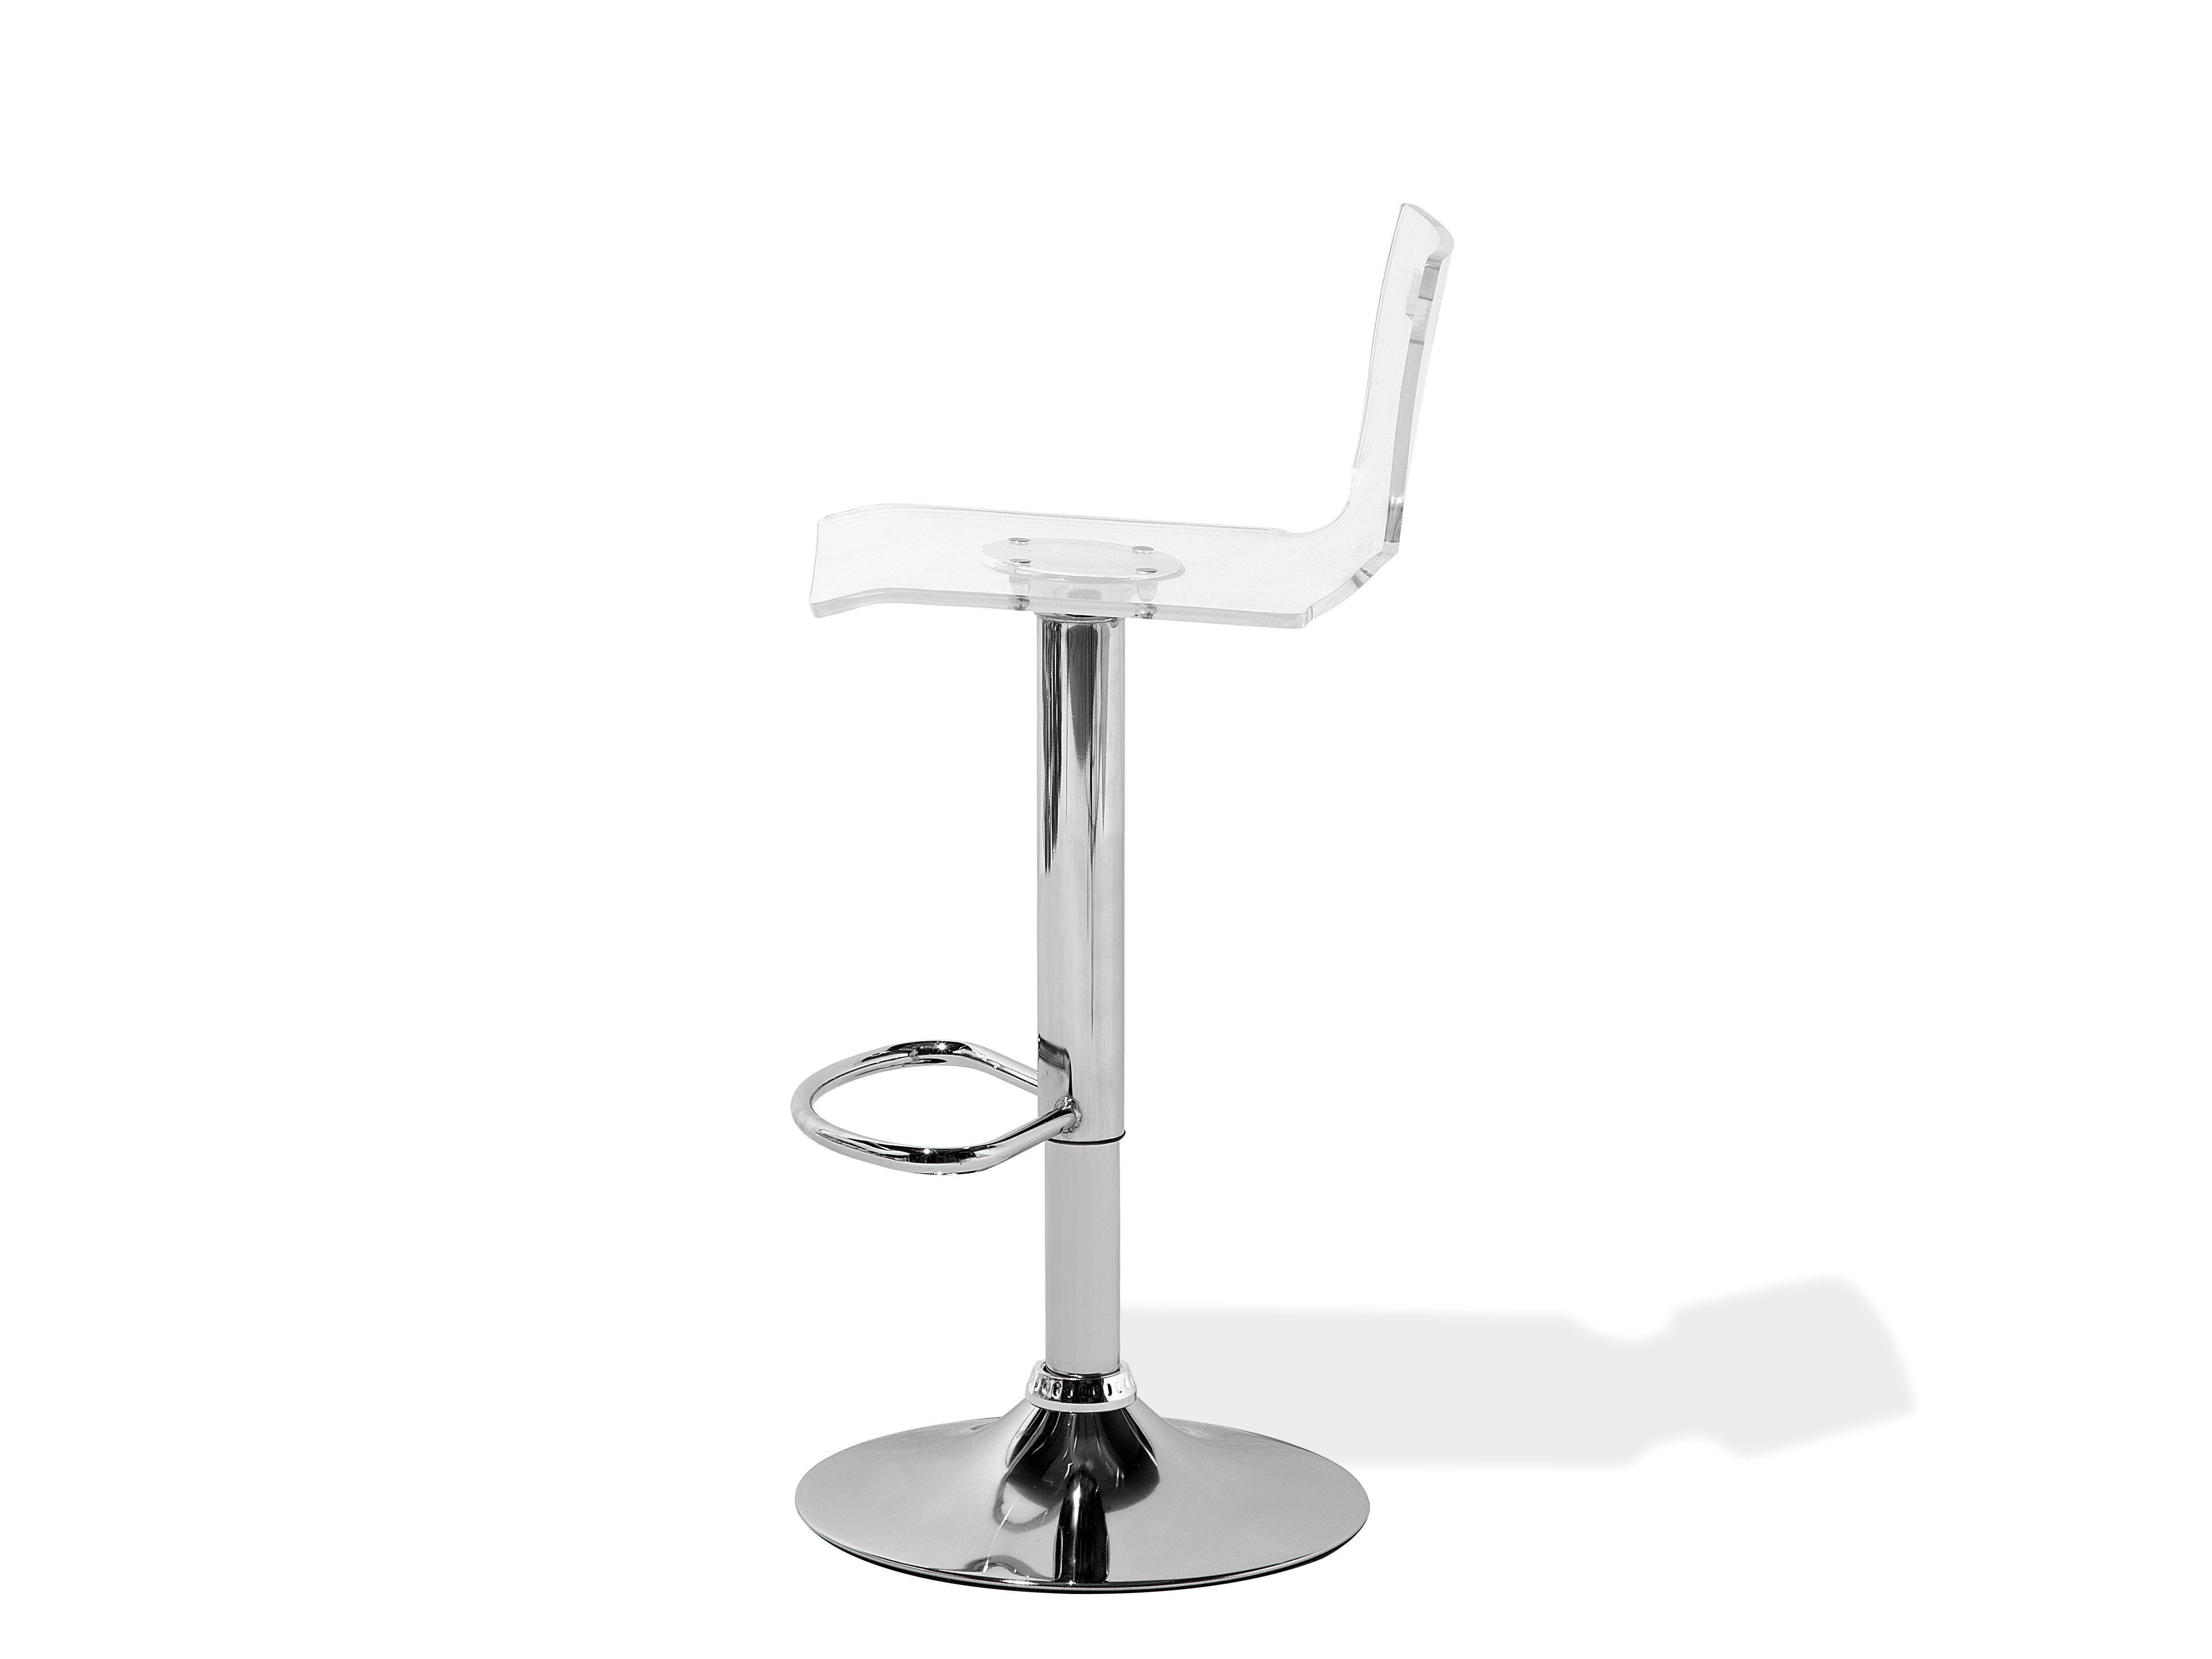 Set of 2 white plastic bar stools